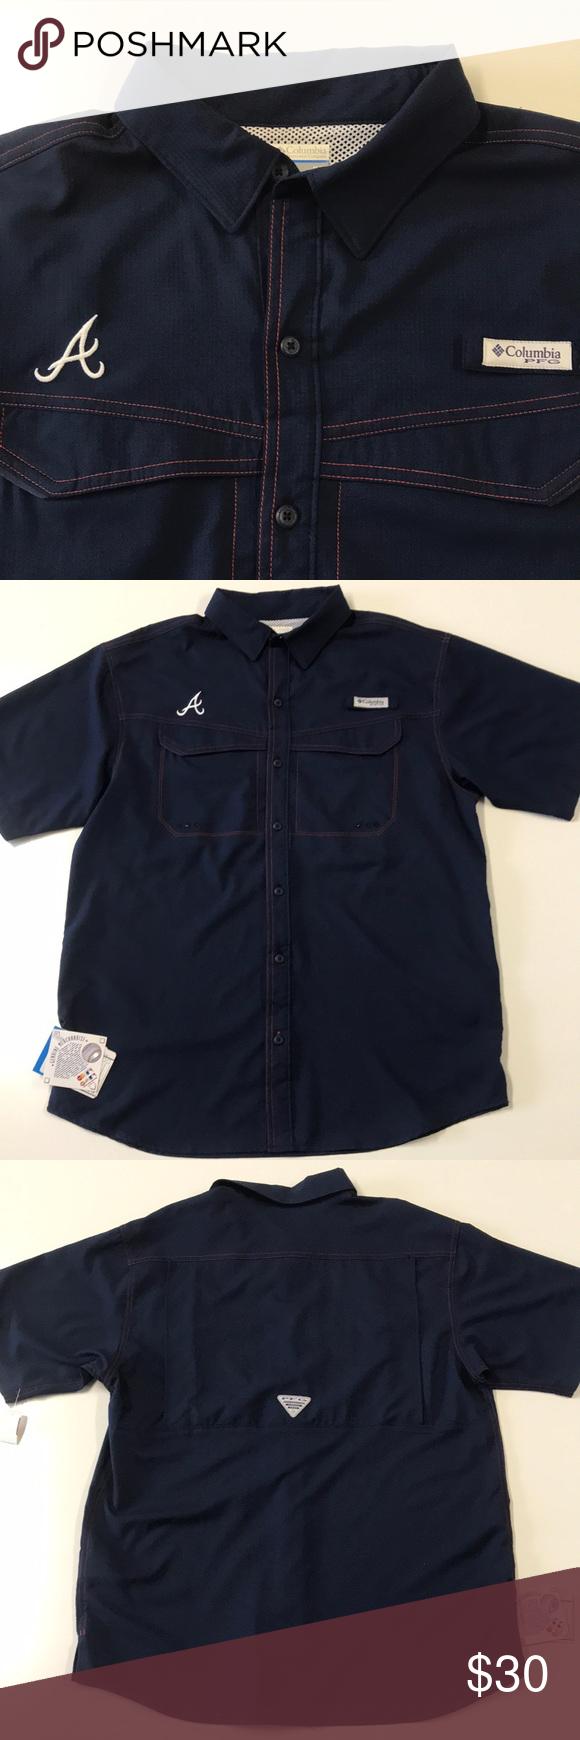 best service 9ae7d a6970 COLUMBIA PFG - ATLANTA BRAVES - BLUE Fishing Shirt NWT ...